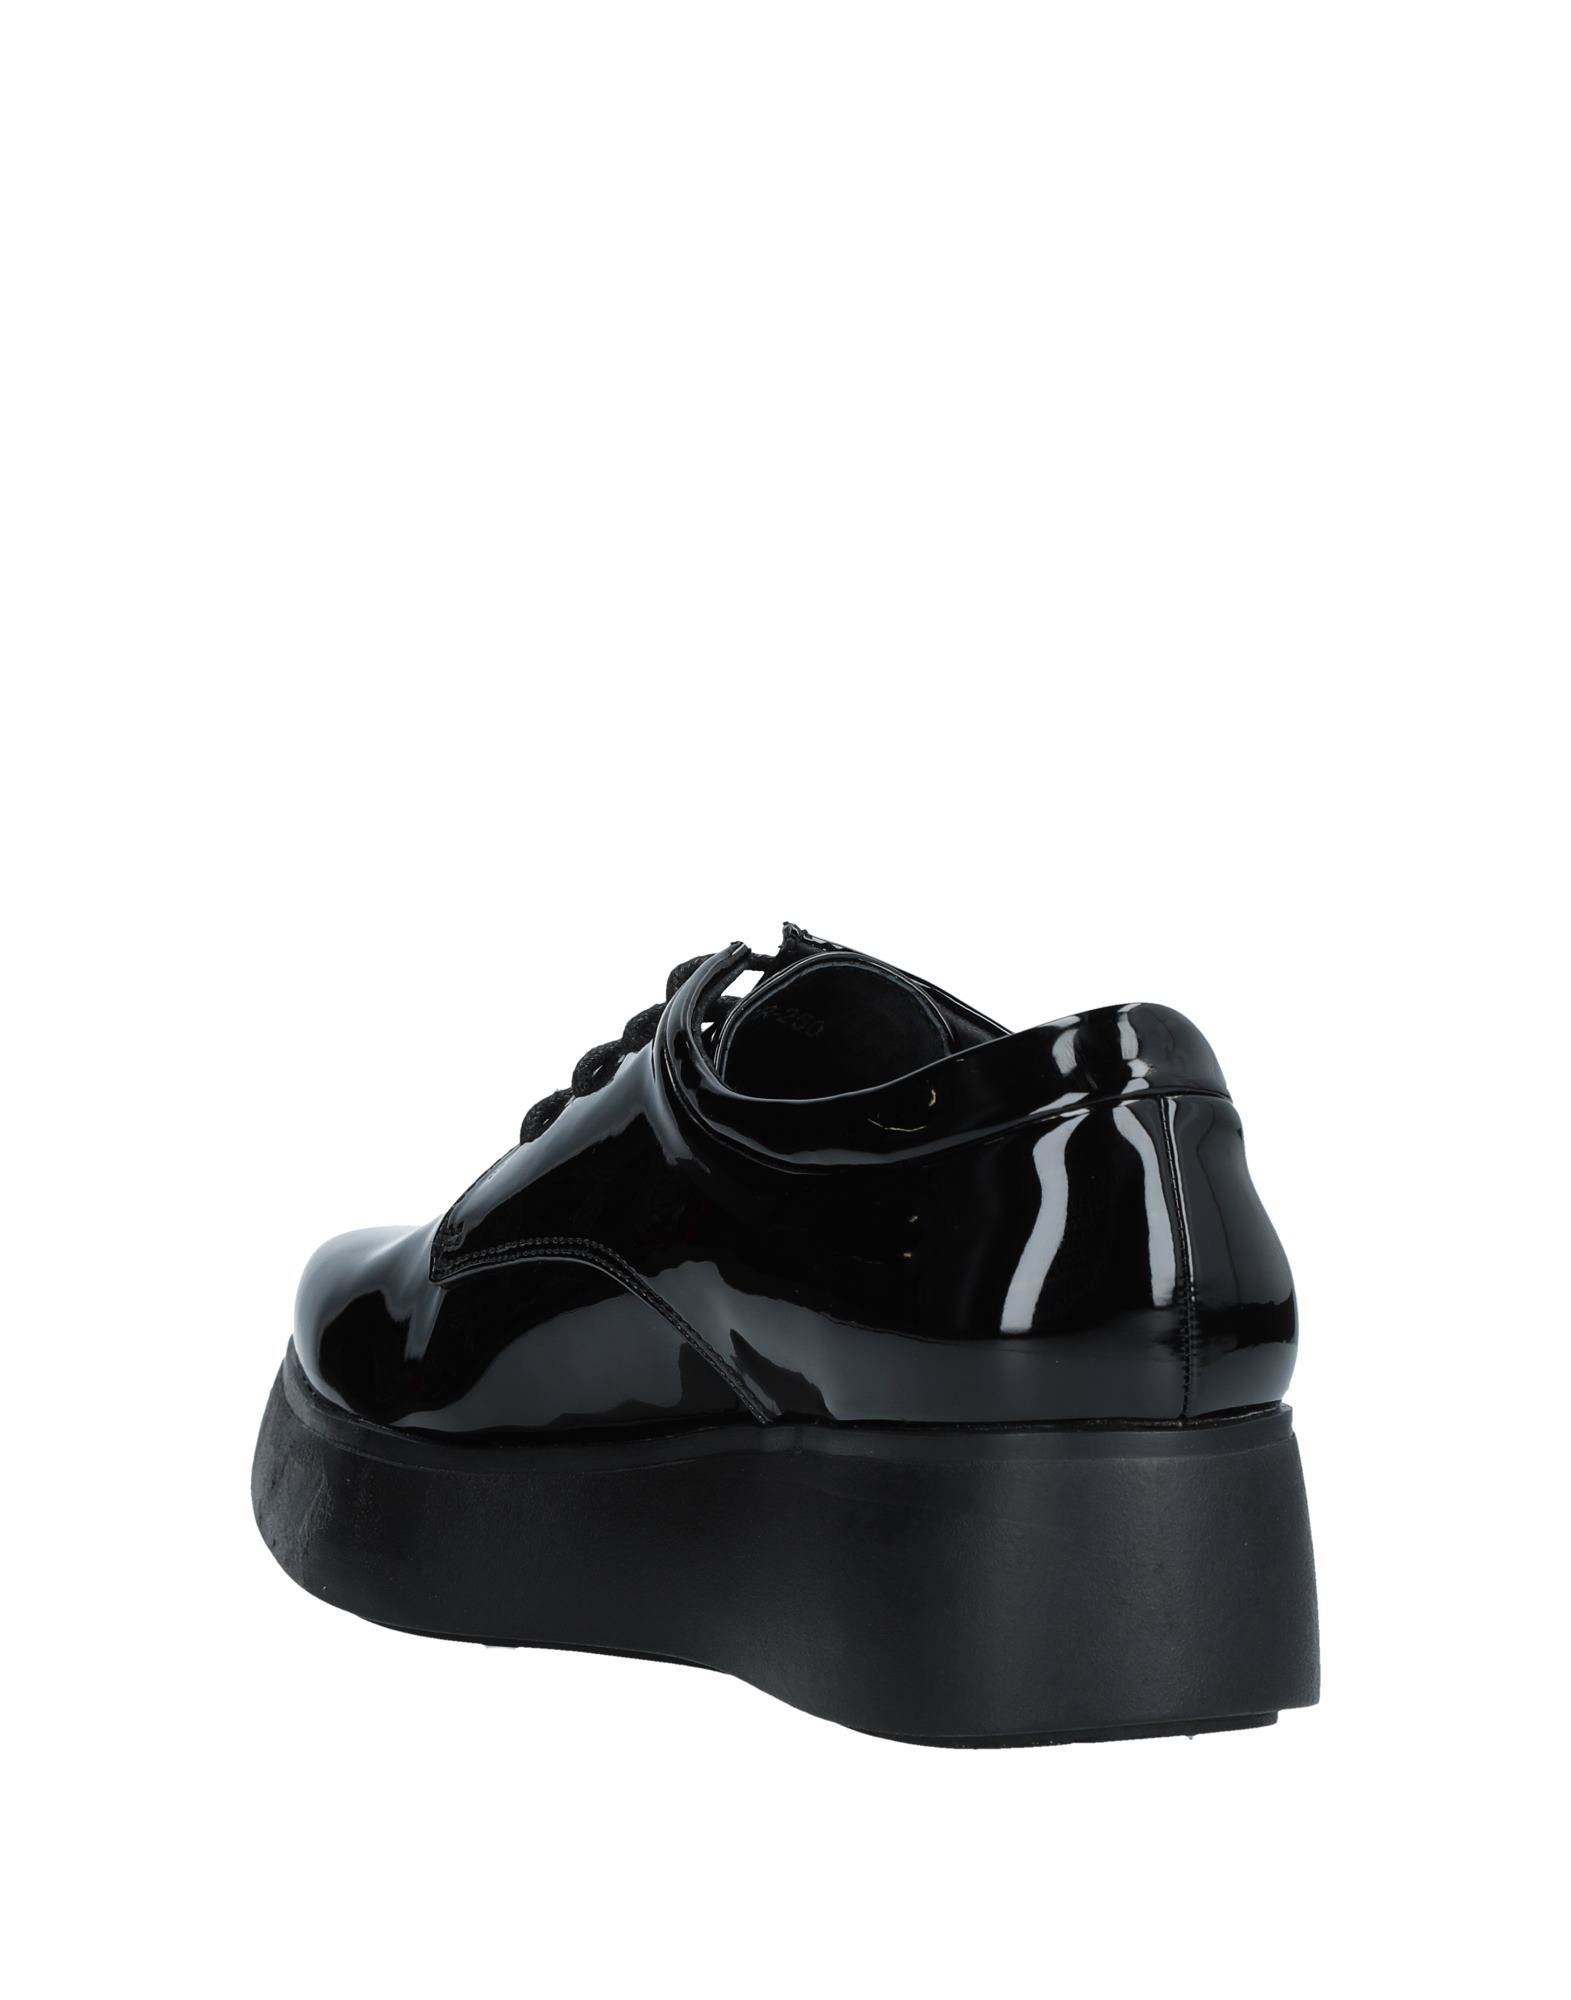 67 Sixtyseven Schnürschuhe  Damen  Schnürschuhe 11542744VE Neue Schuhe 698c33